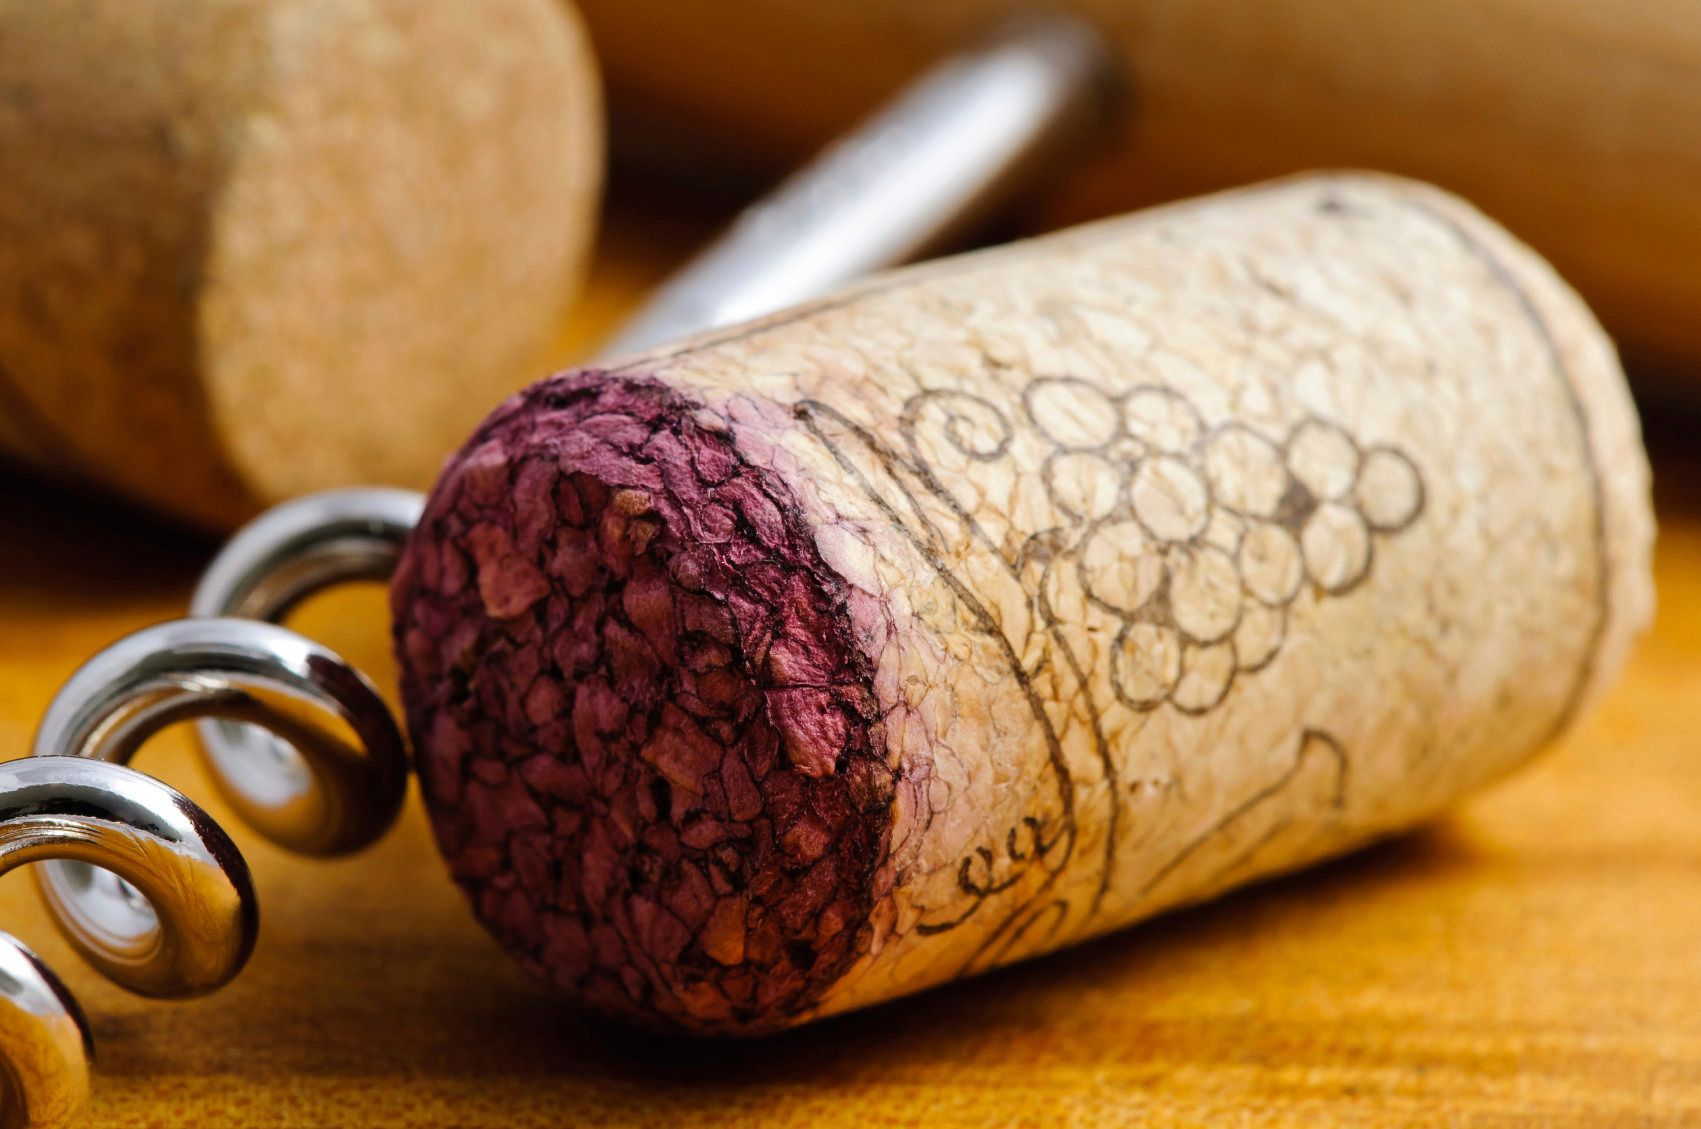 Closeup detail of wine cork and corkscrew